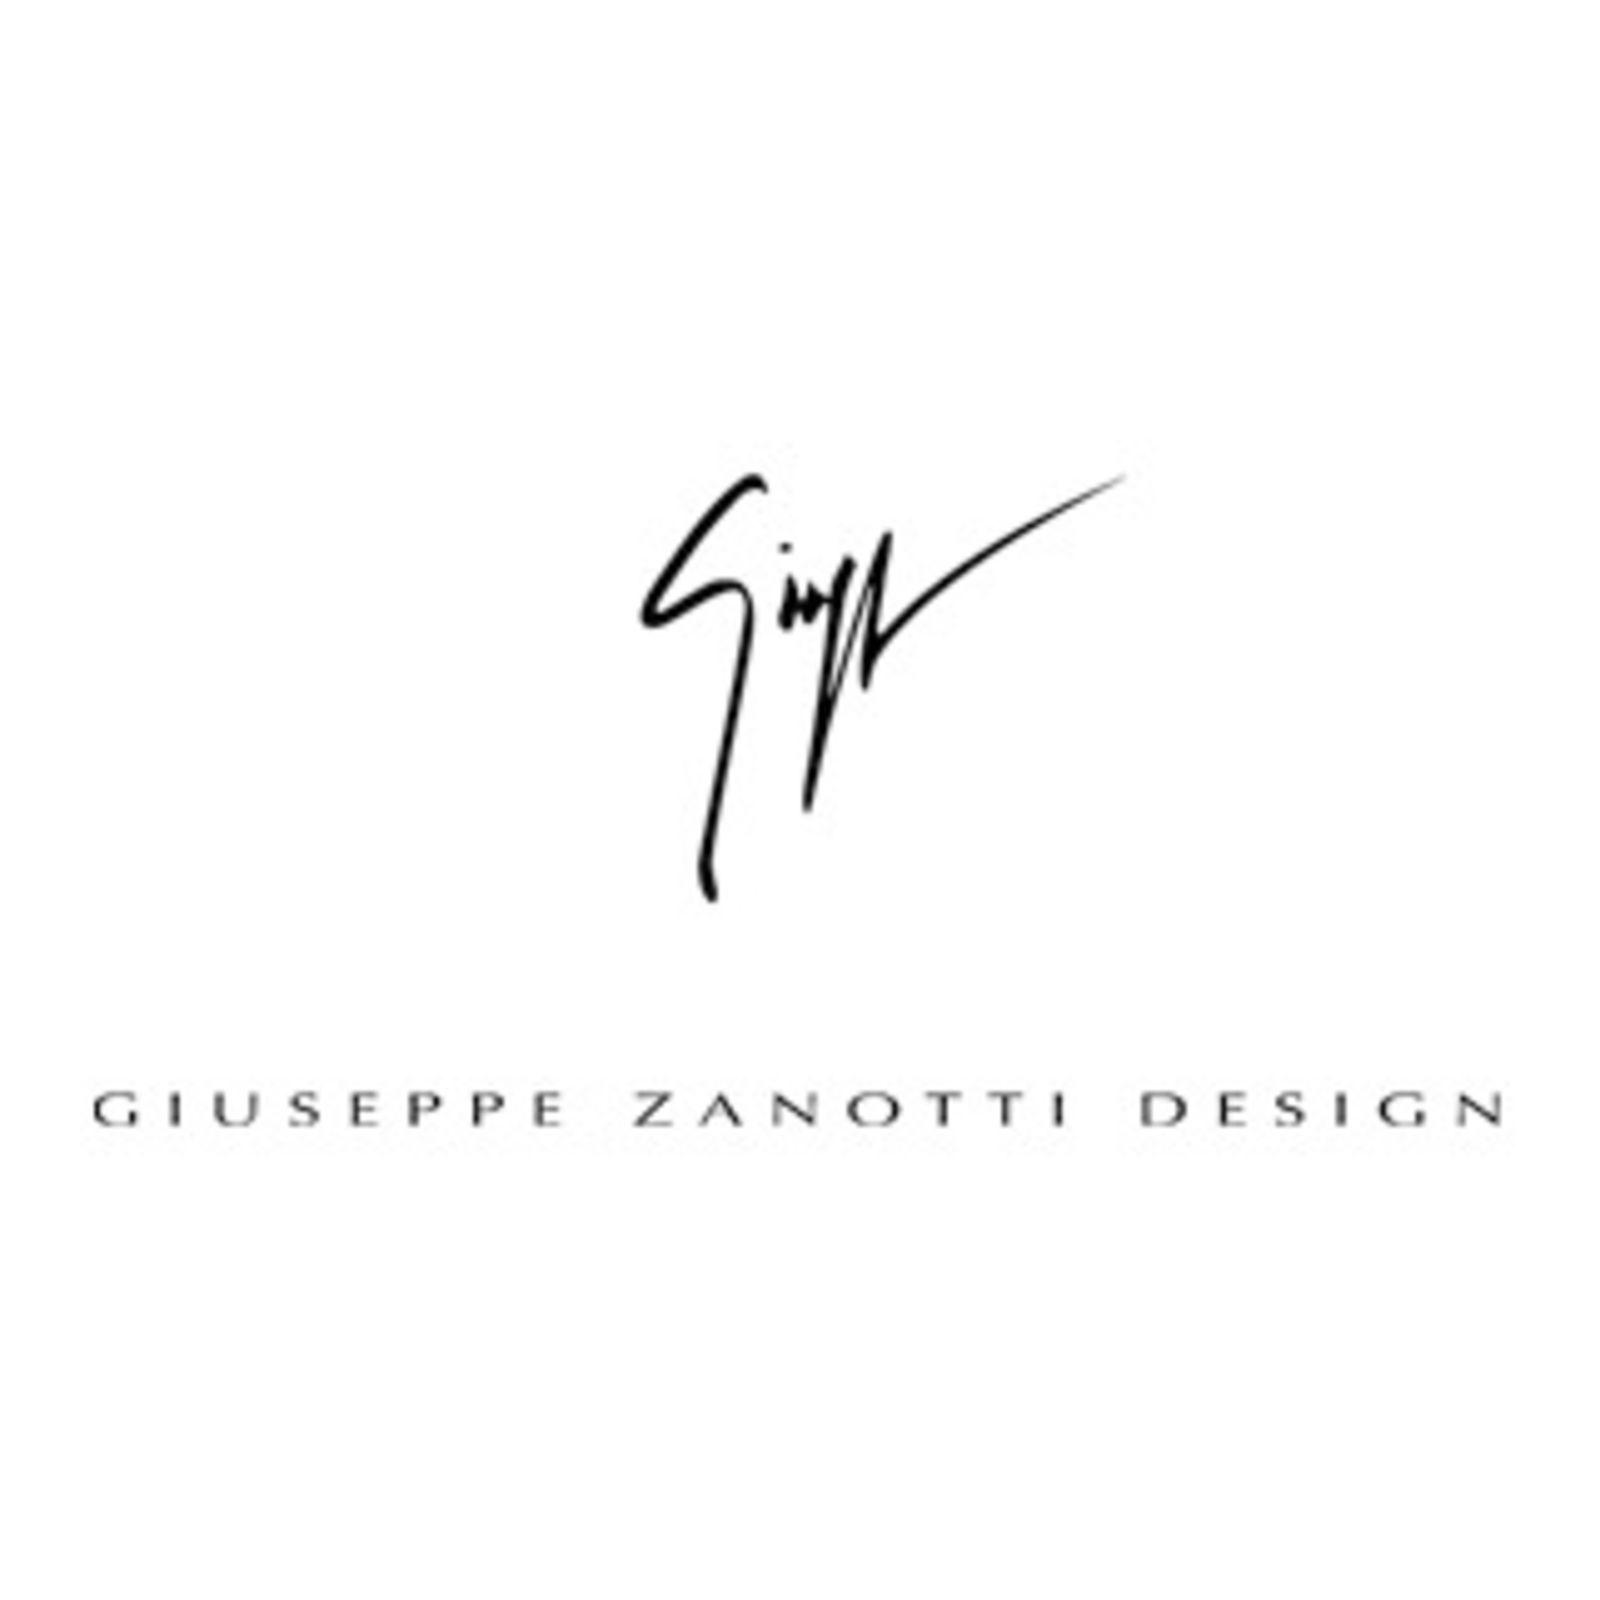 GIUSEPPE ZANOTTI DESIGN (Image 1)